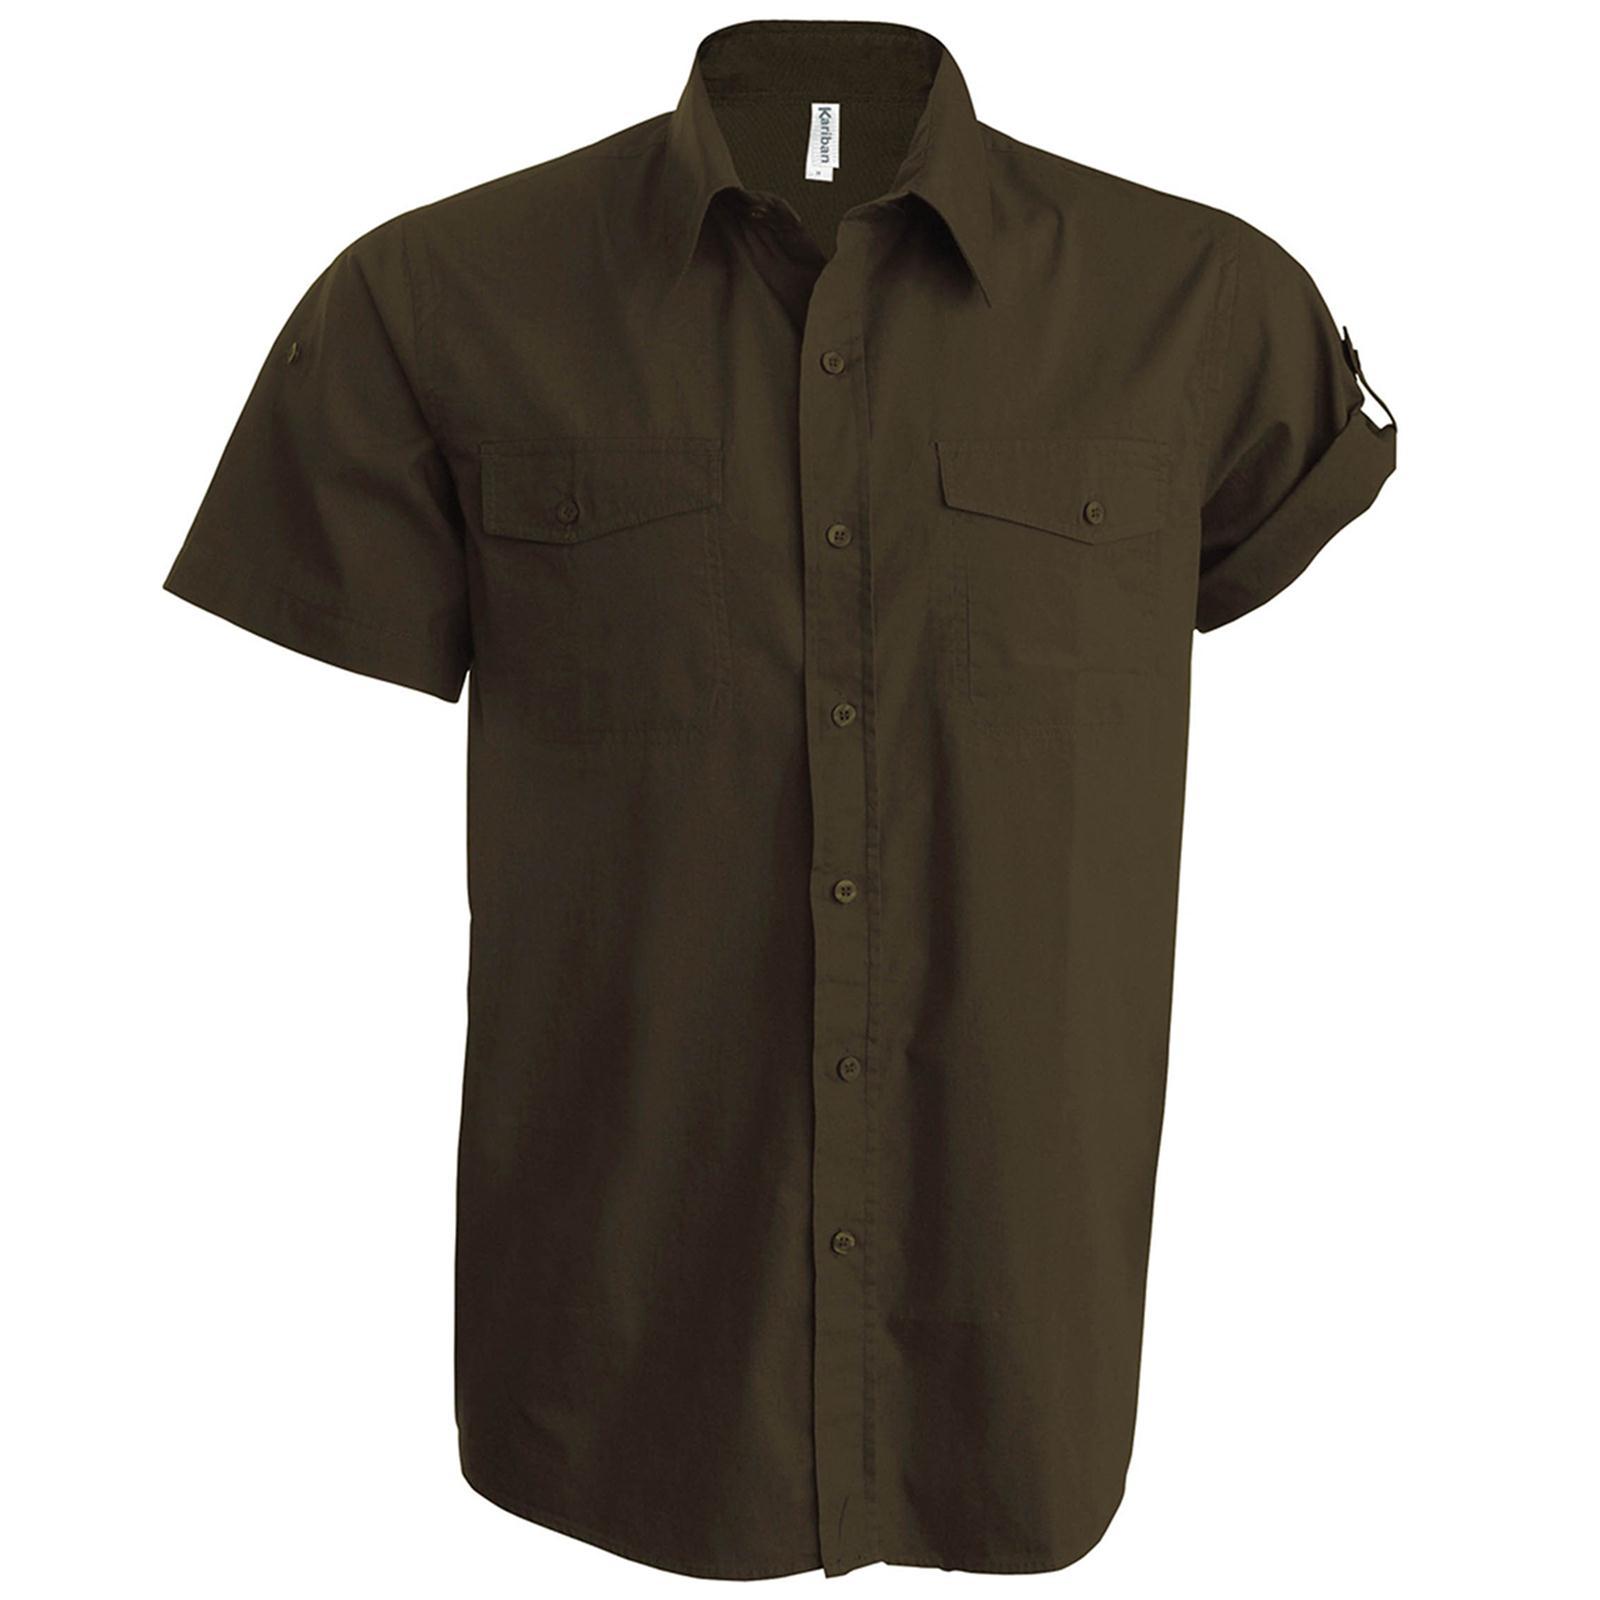 New Kariban Mens Tropical Safari Short Tab Sleeve Shirt In